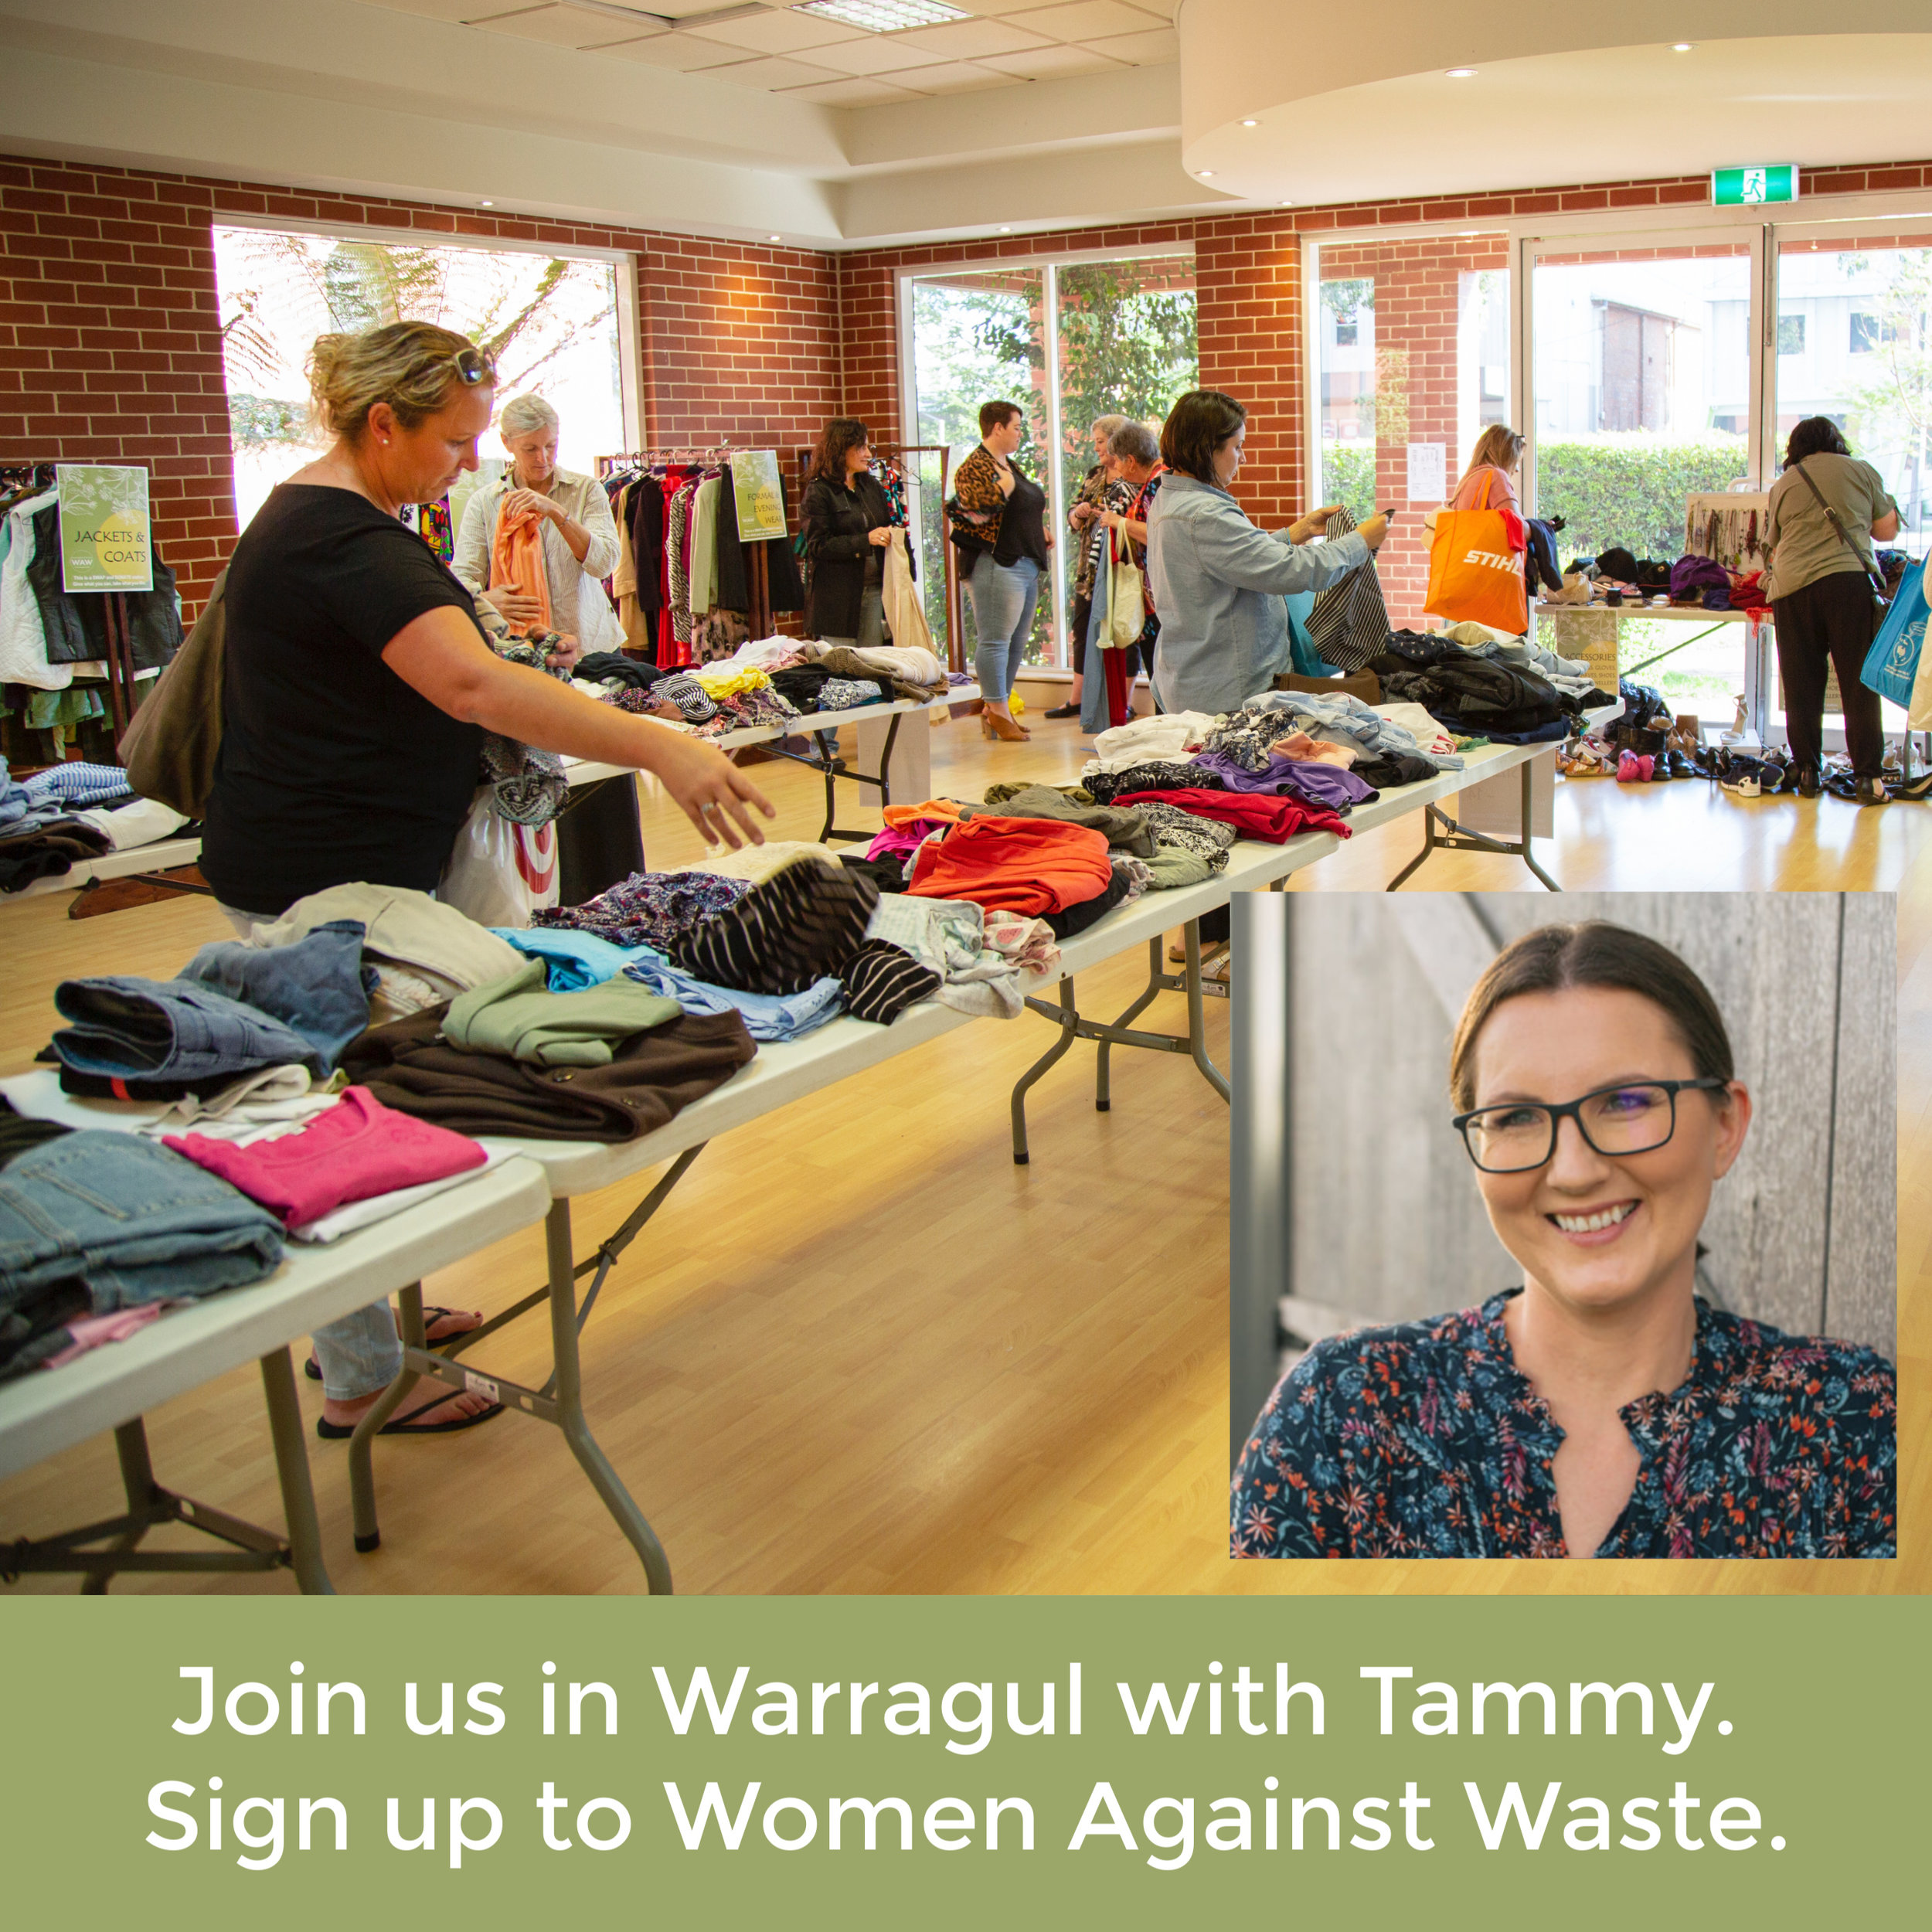 Warragul WAW event